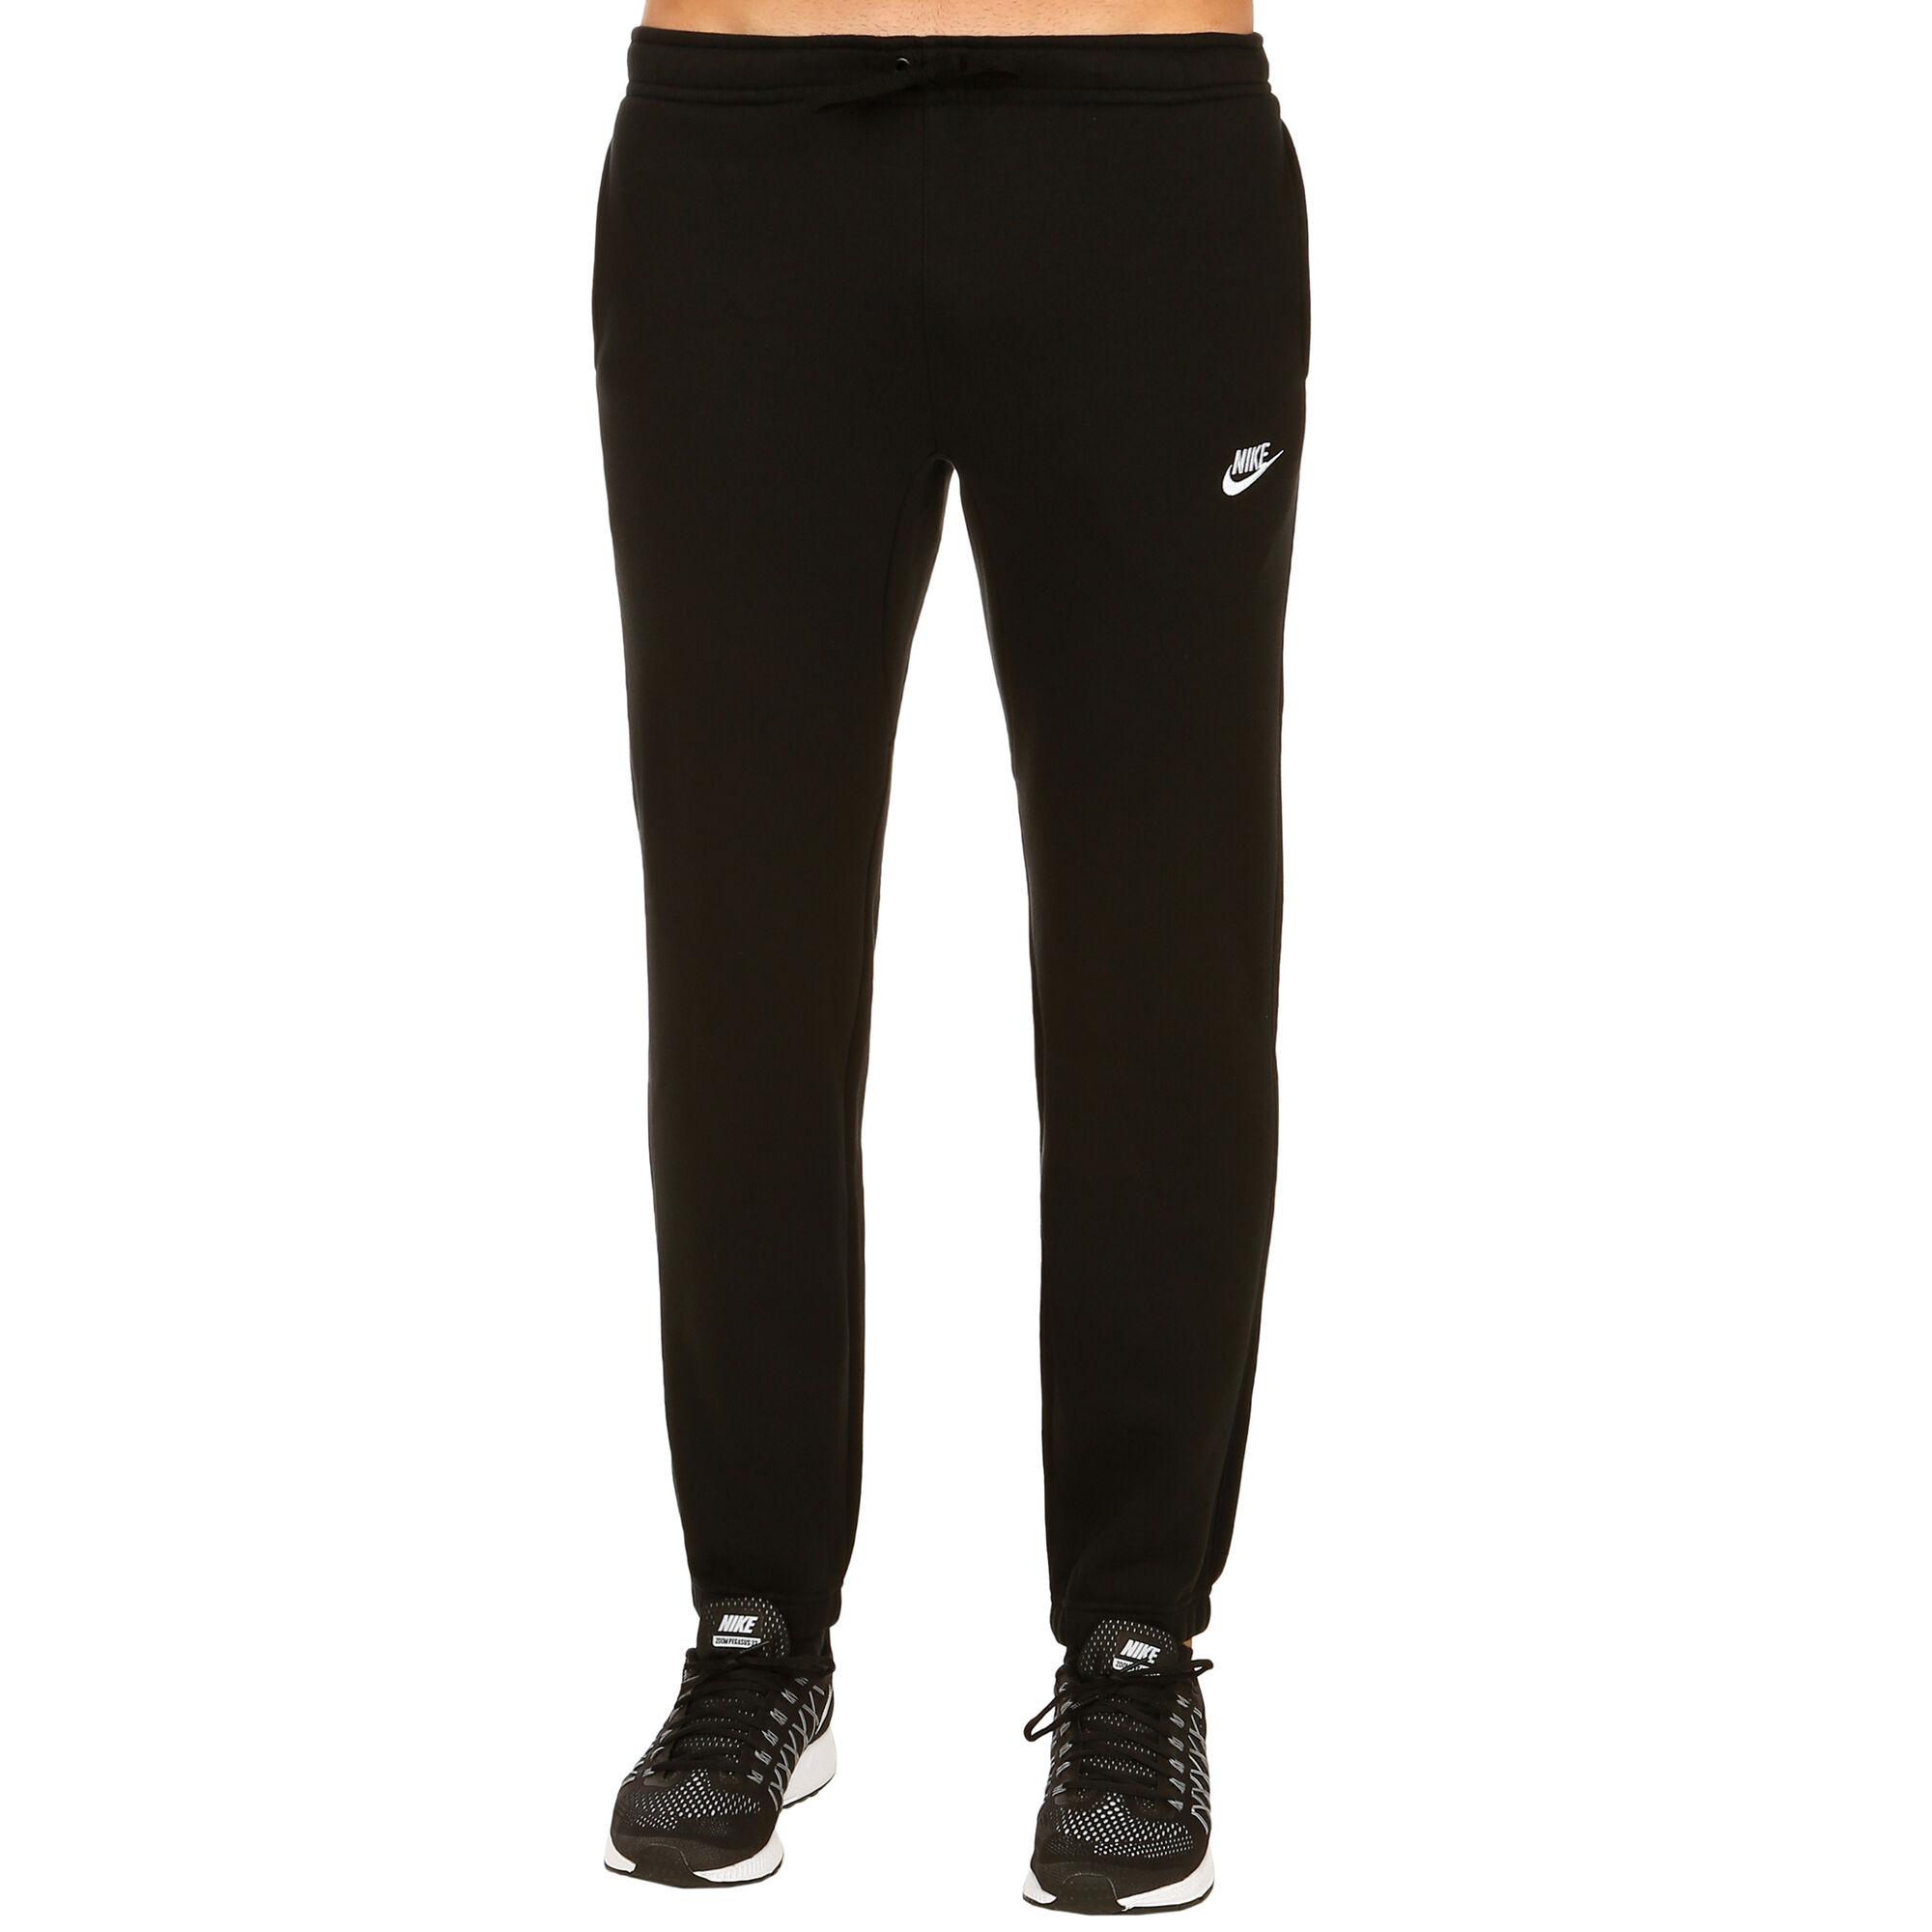 b5e3ab1661901a Nike Sportswear Trainingshose Herren - Schwarz